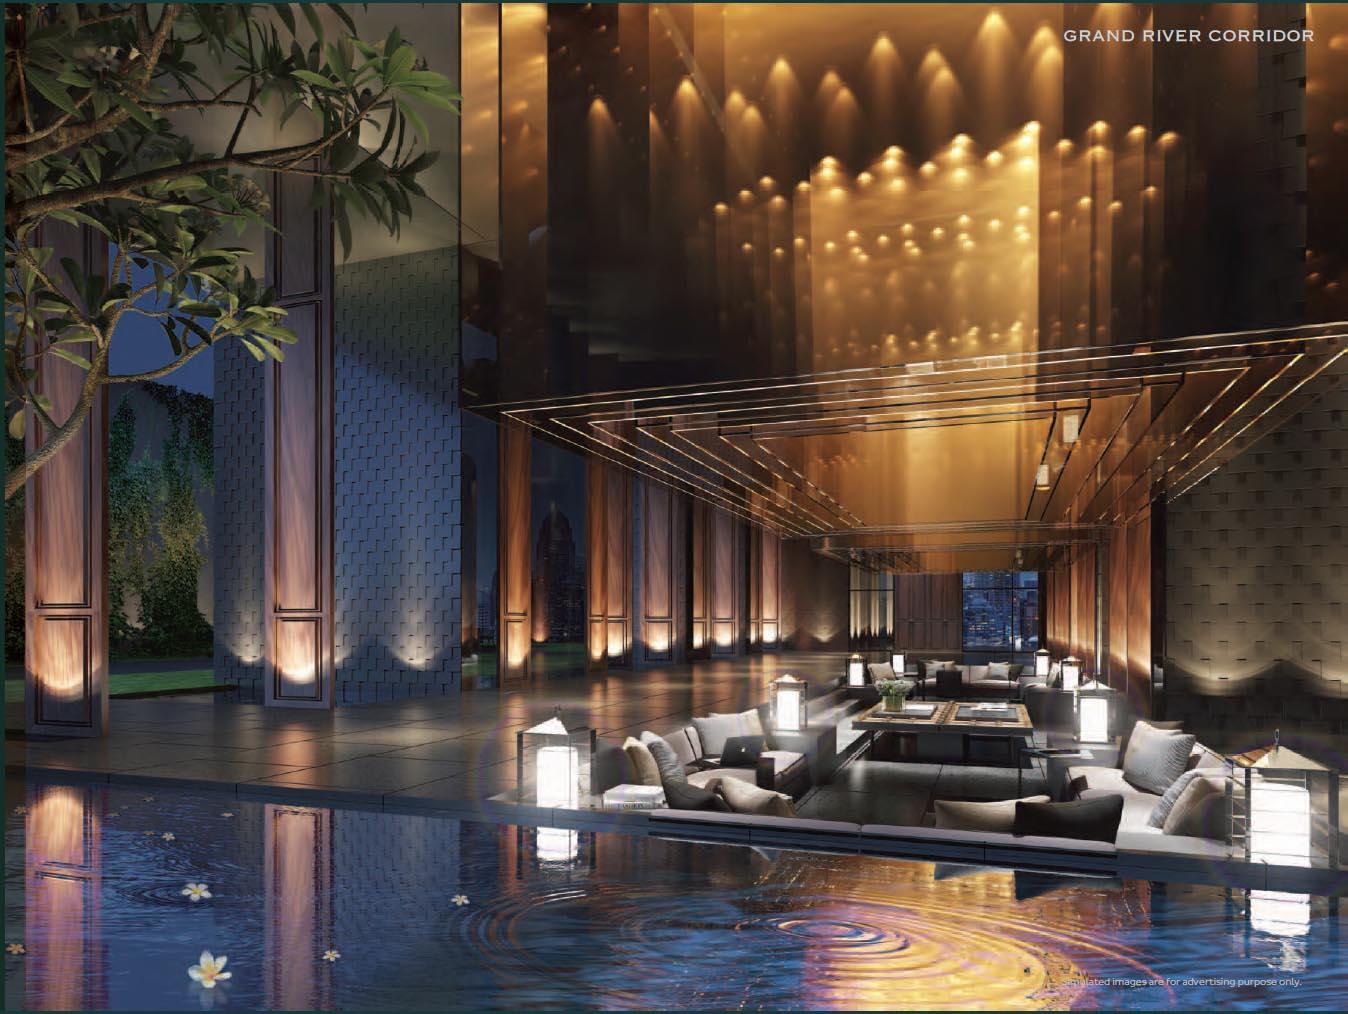 ASHTON-Asoke-Bangkok, Thailand Living ashton asoke bangkok ASHTON Asoke Bangkok |Showflat Hotline +65 61007122 Ashton Asoke grand river corridor